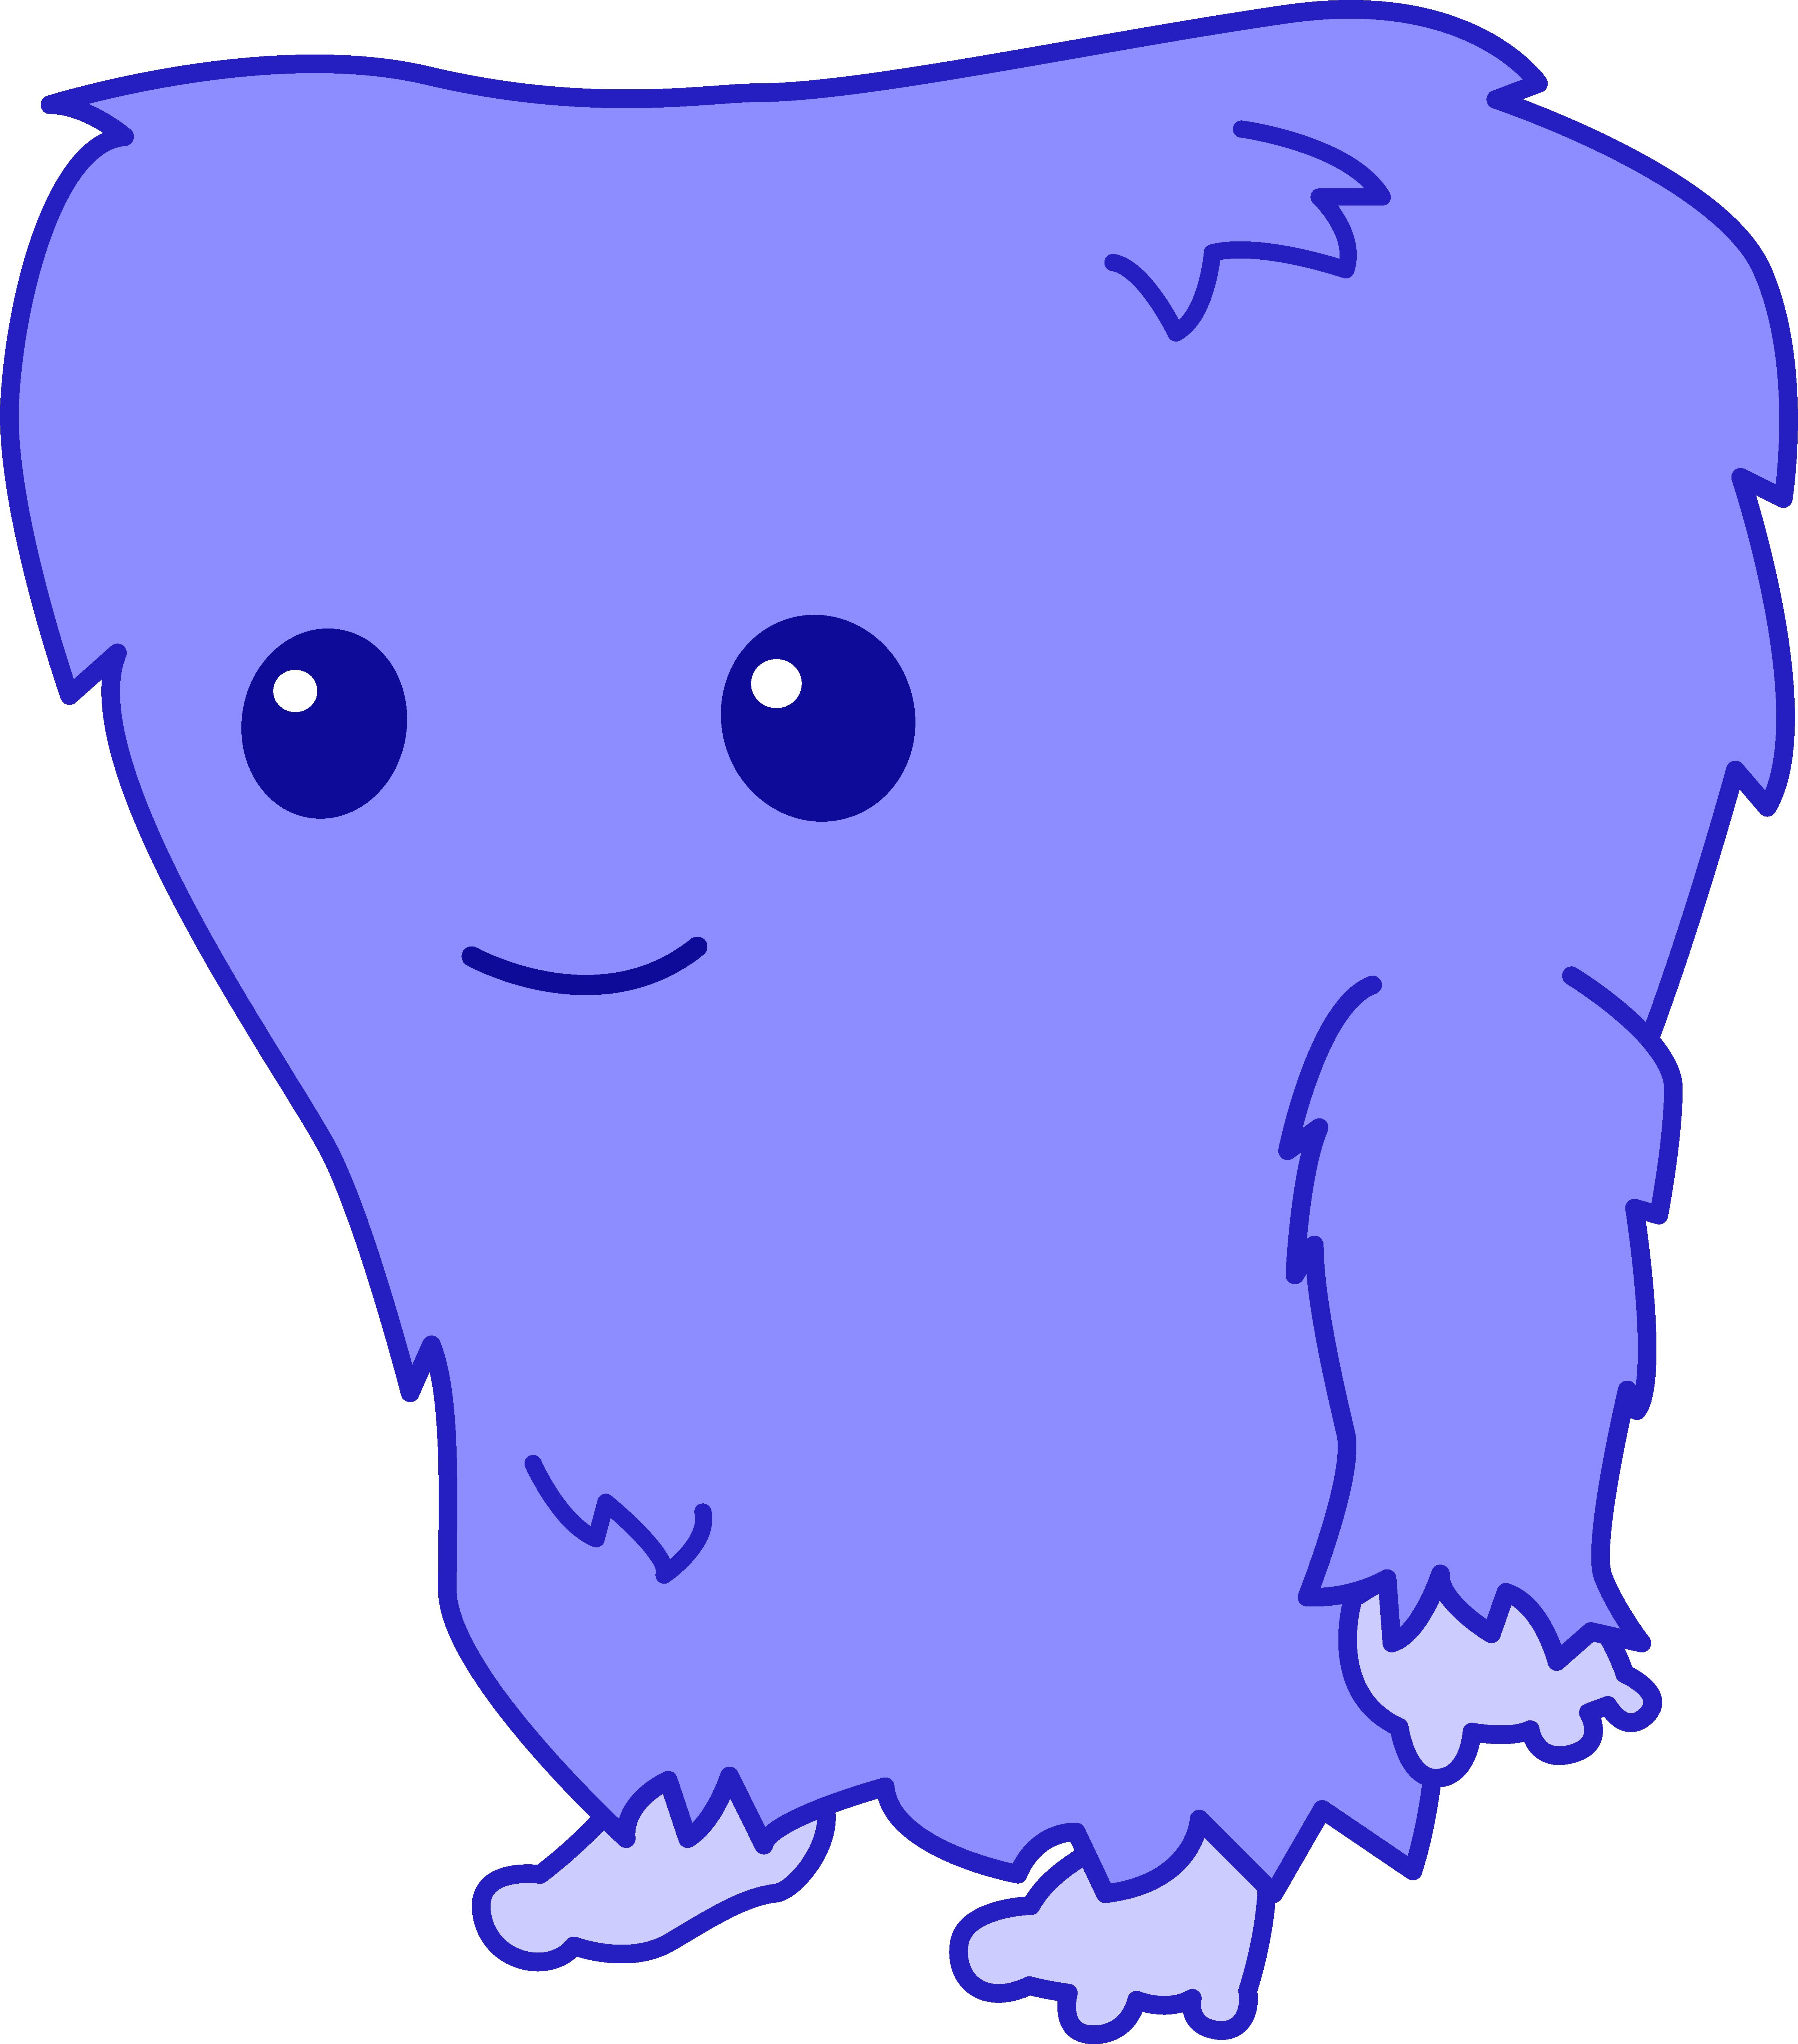 4812x5470 Cute Fuzzy Blue Monster